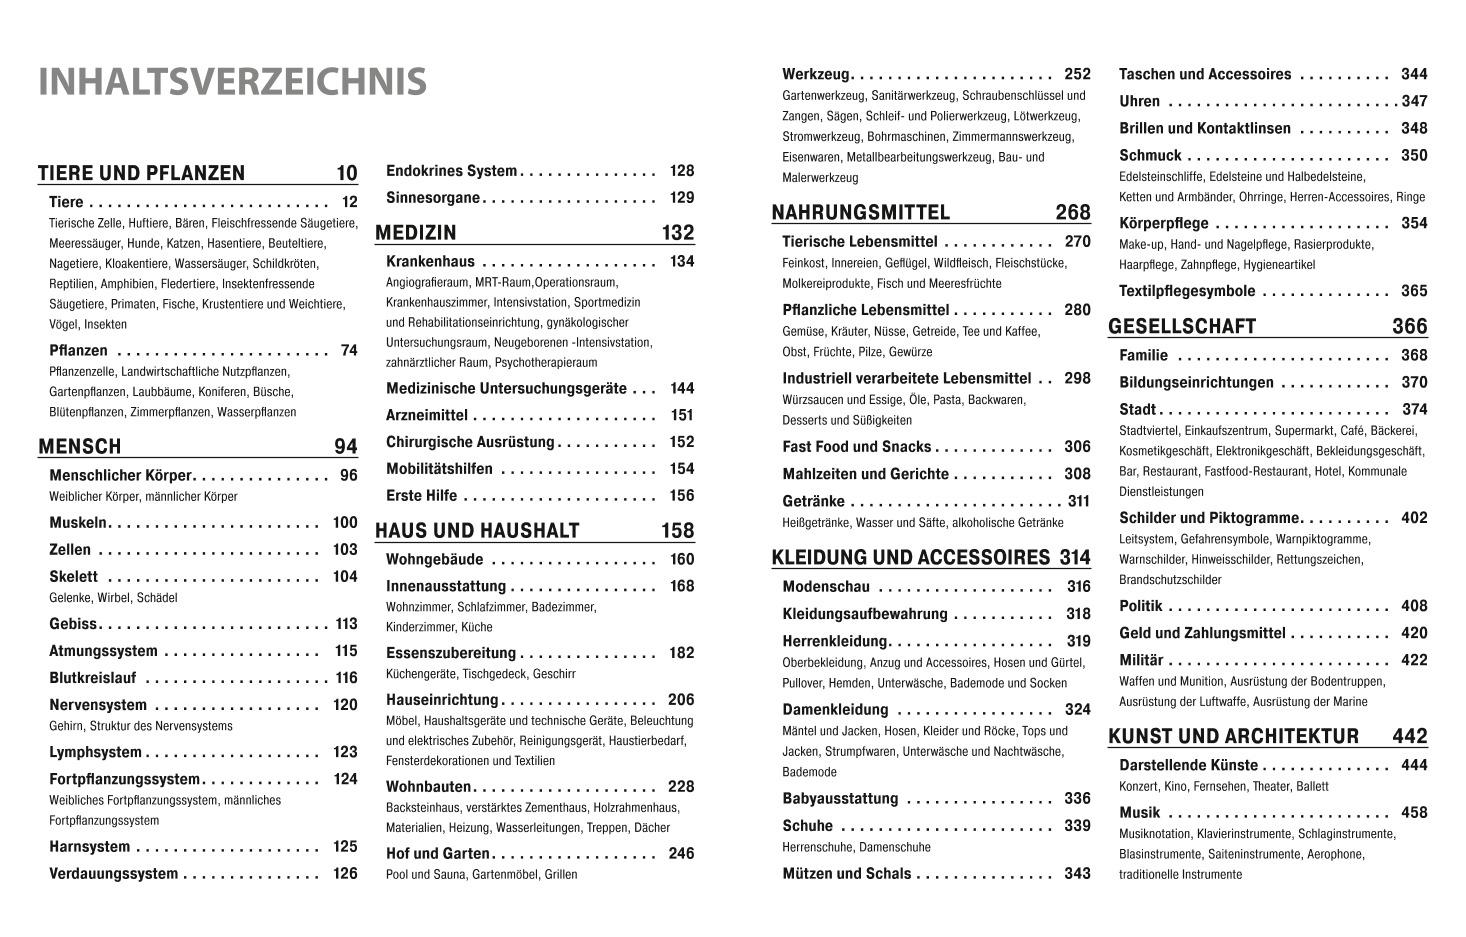 Das große multilinguale Bildwörterbuch